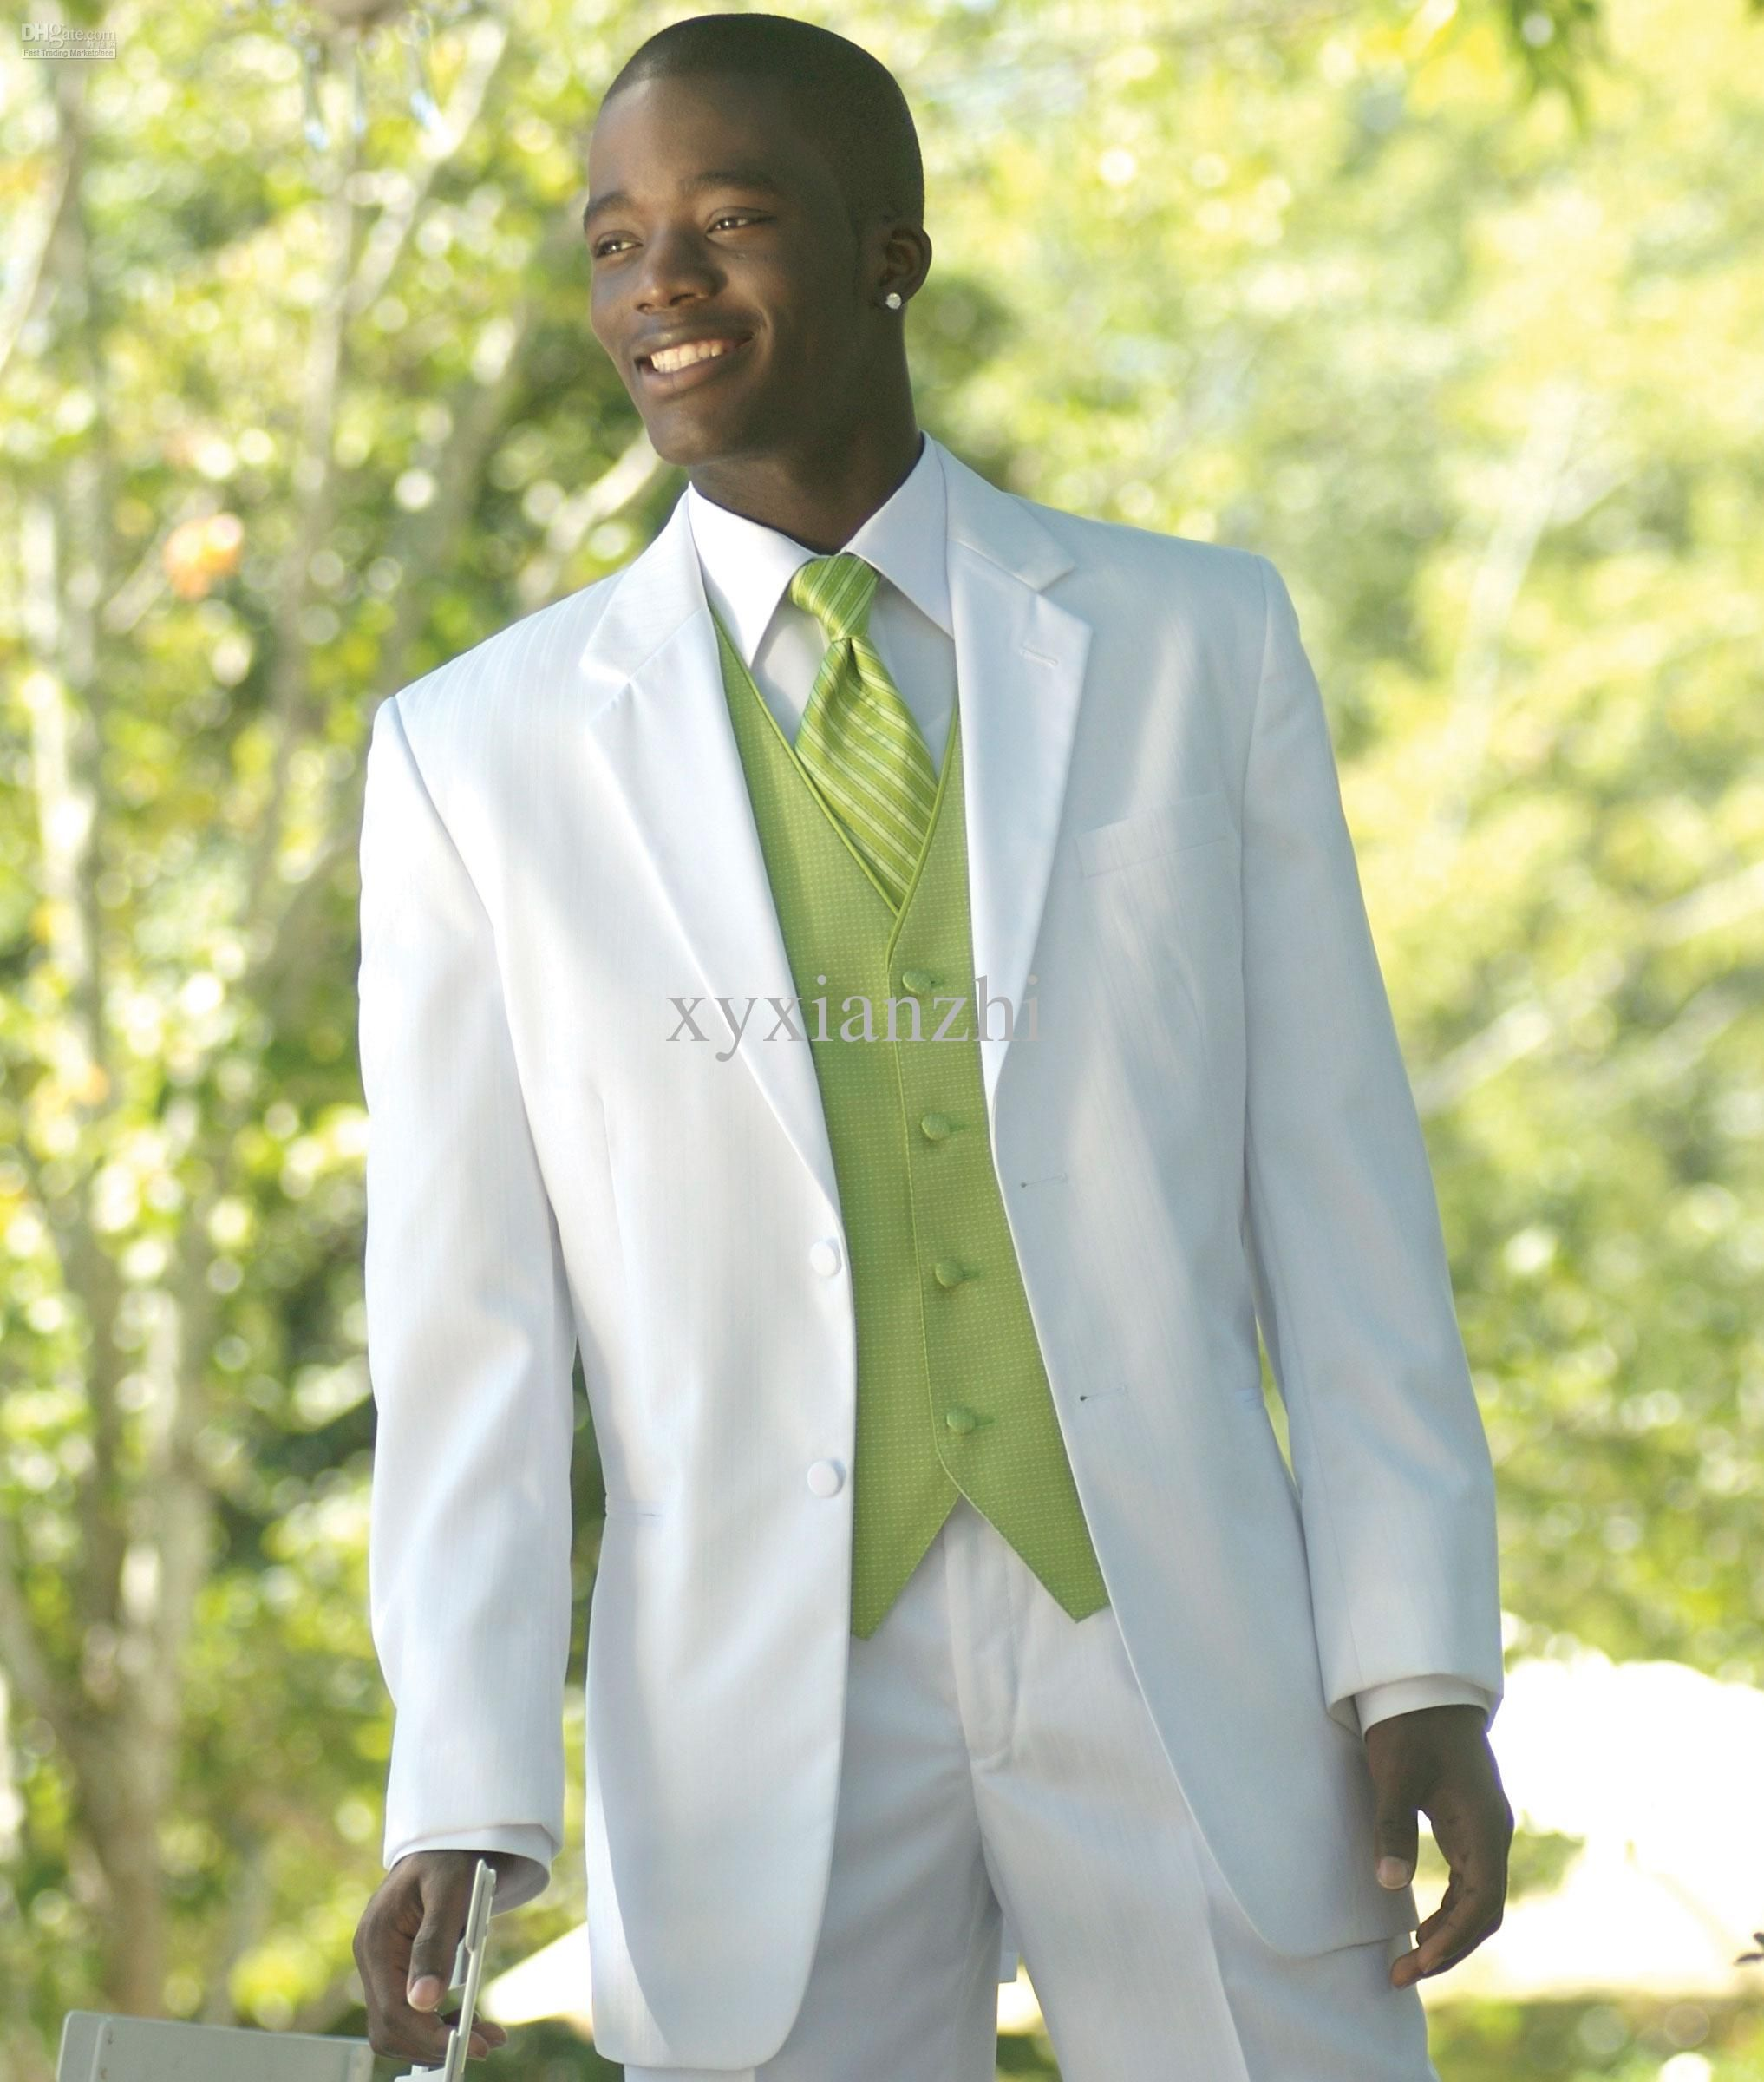 grooms wedding attire wedding suits grooms attire for spring weddingGoogle SearchWedding Attire